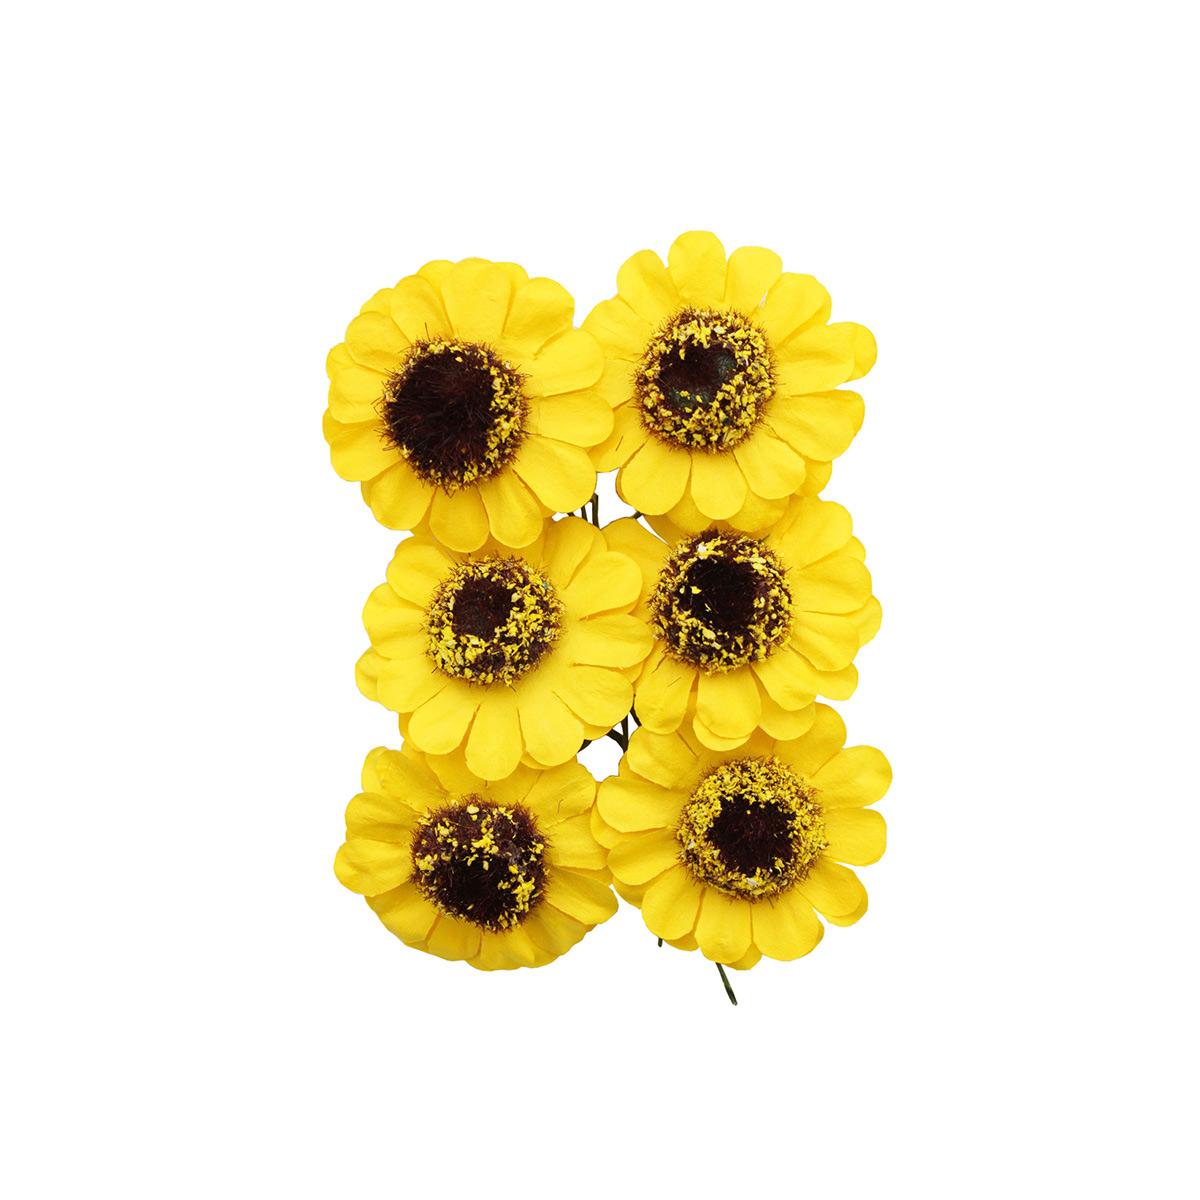 MH3-2313 Набор декоративных цветов, цв.желтый, D=4*2см, 6шт, Астра